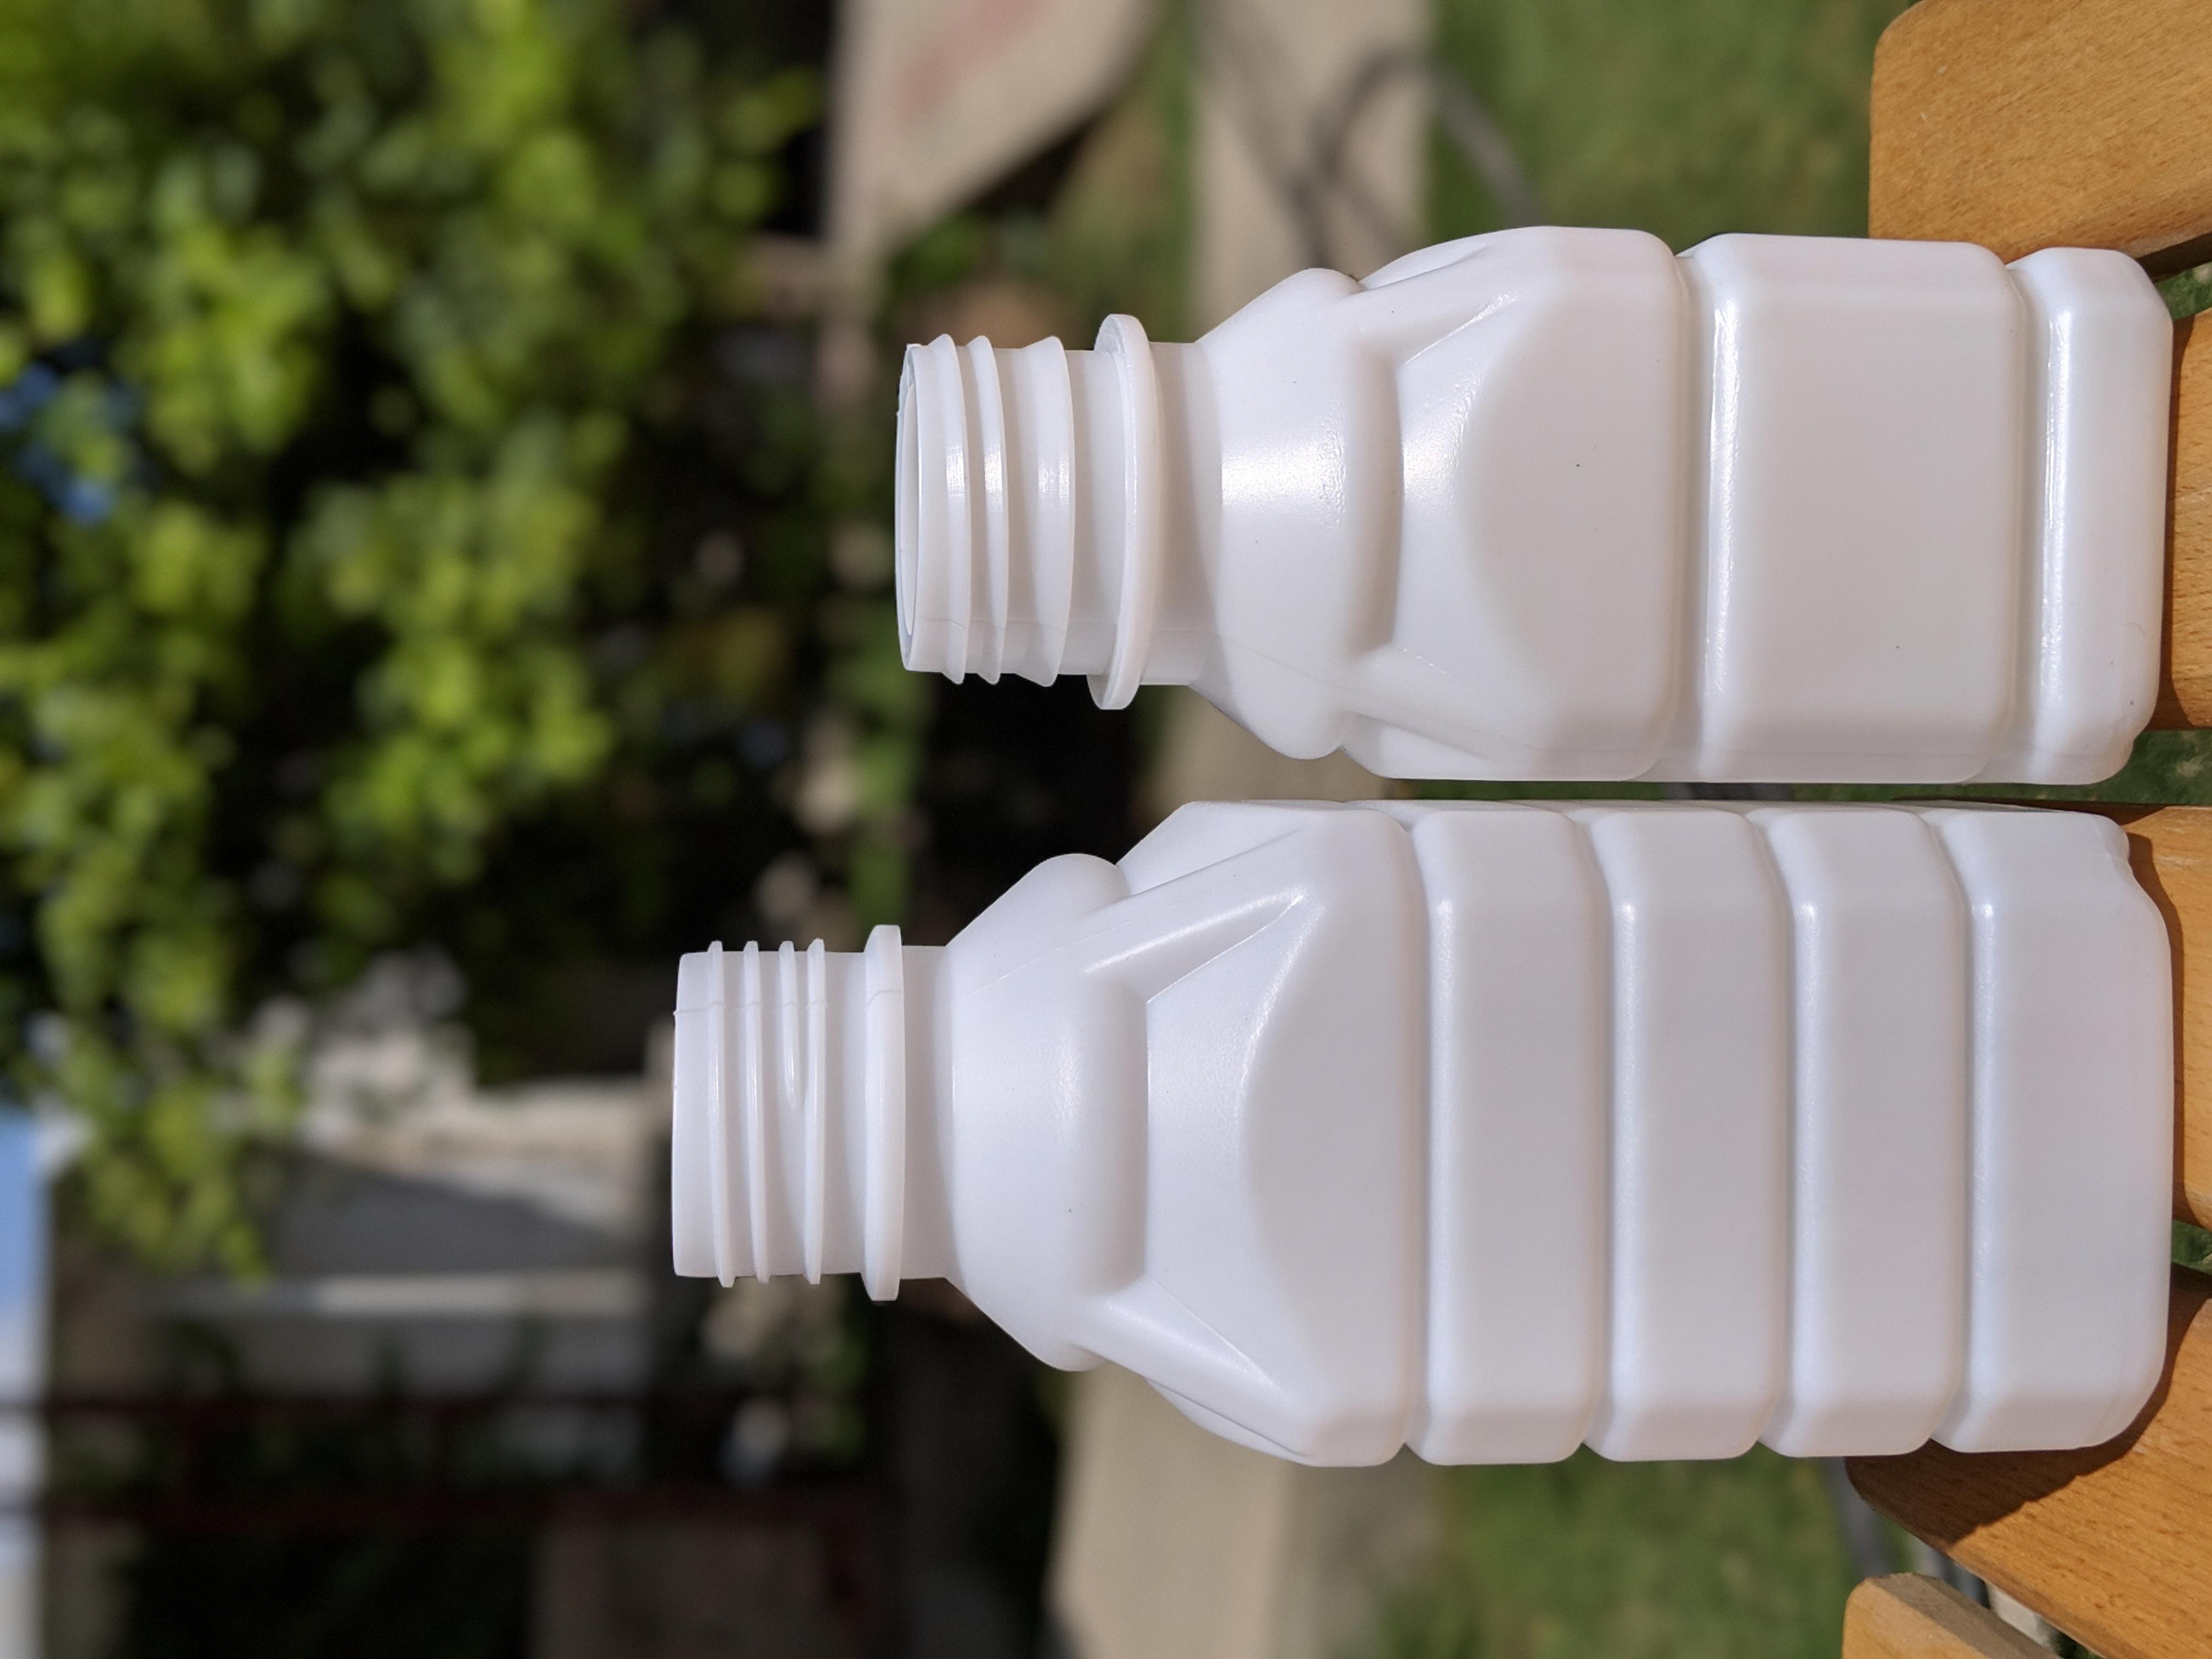 Arched Square Shape Bottles